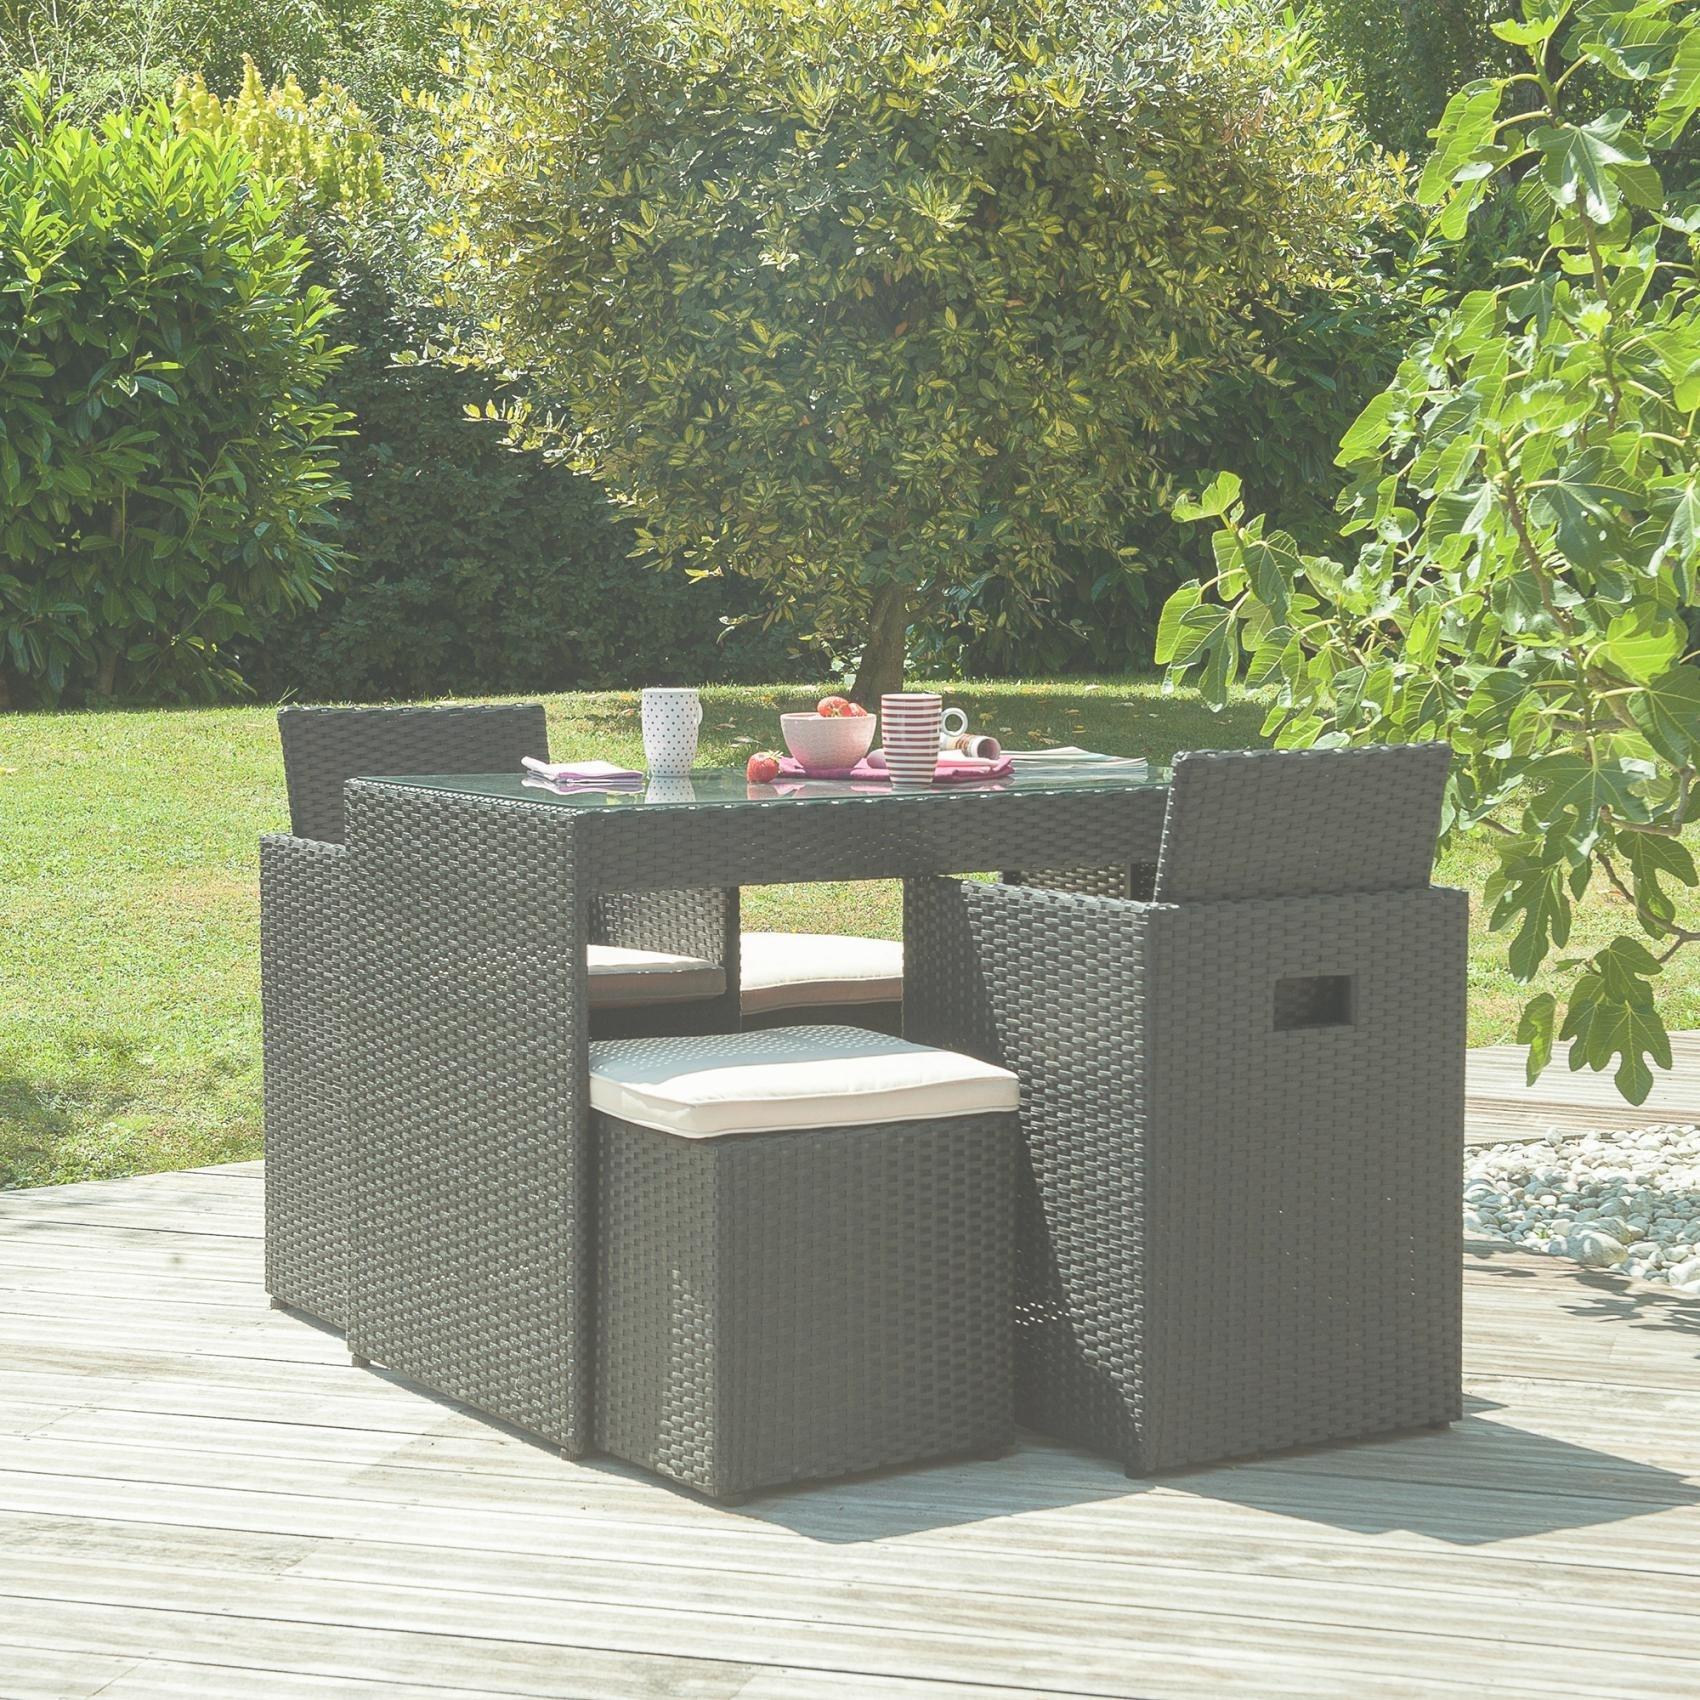 72 beau photos de gifi etendoir a linge. Black Bedroom Furniture Sets. Home Design Ideas